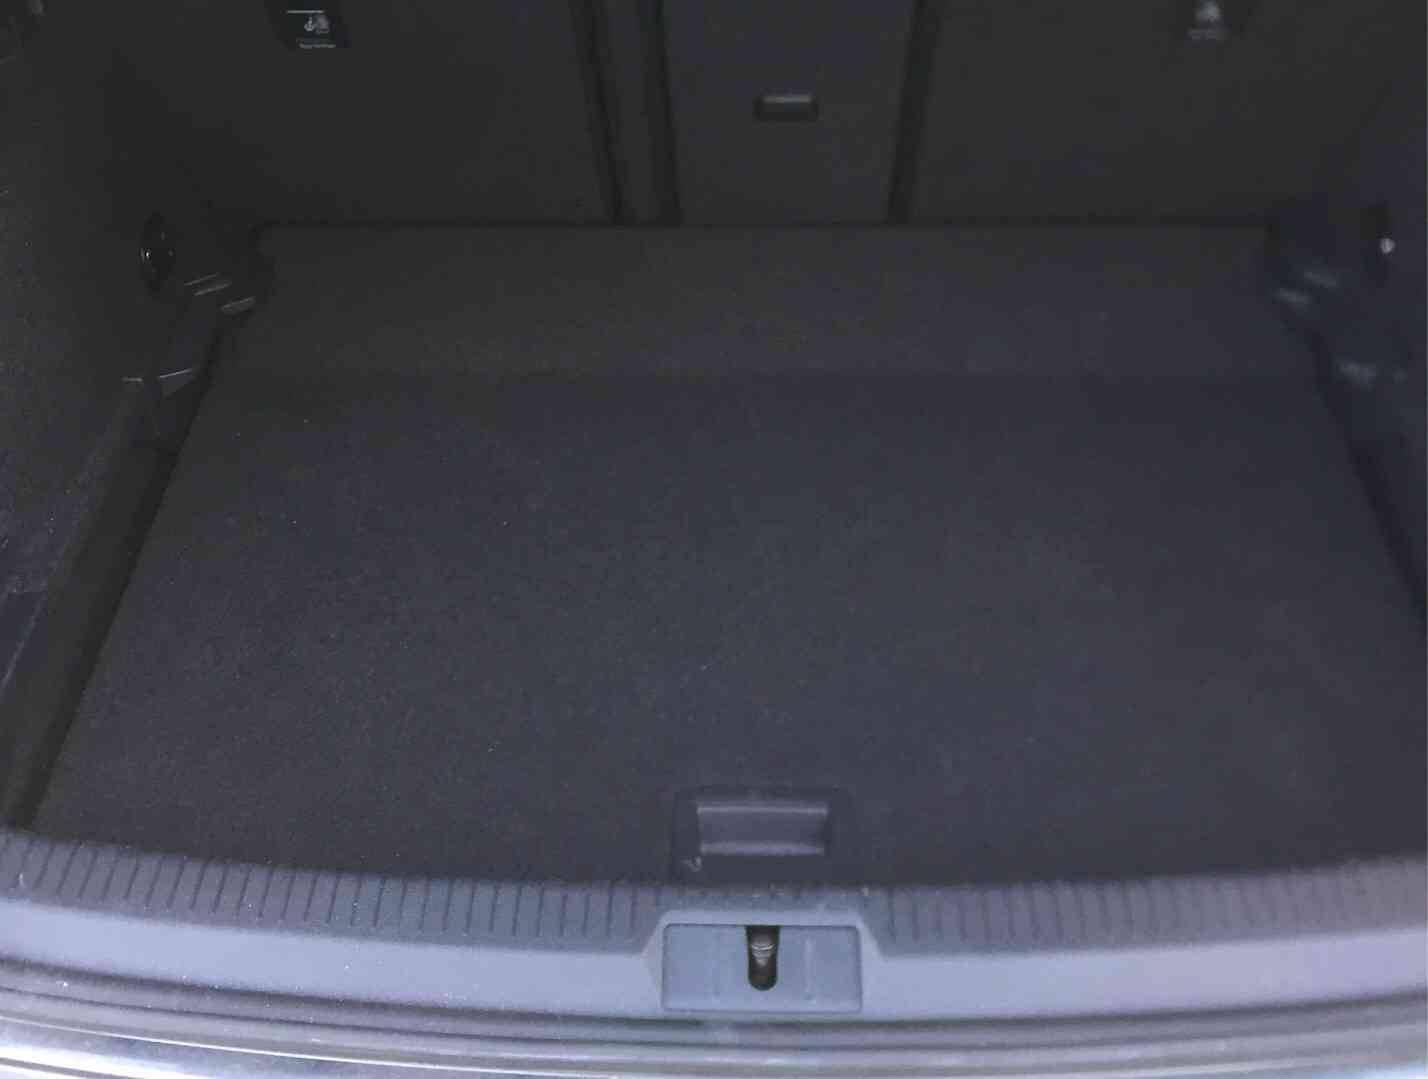 Golf 1.4 TSI 125 DSG7